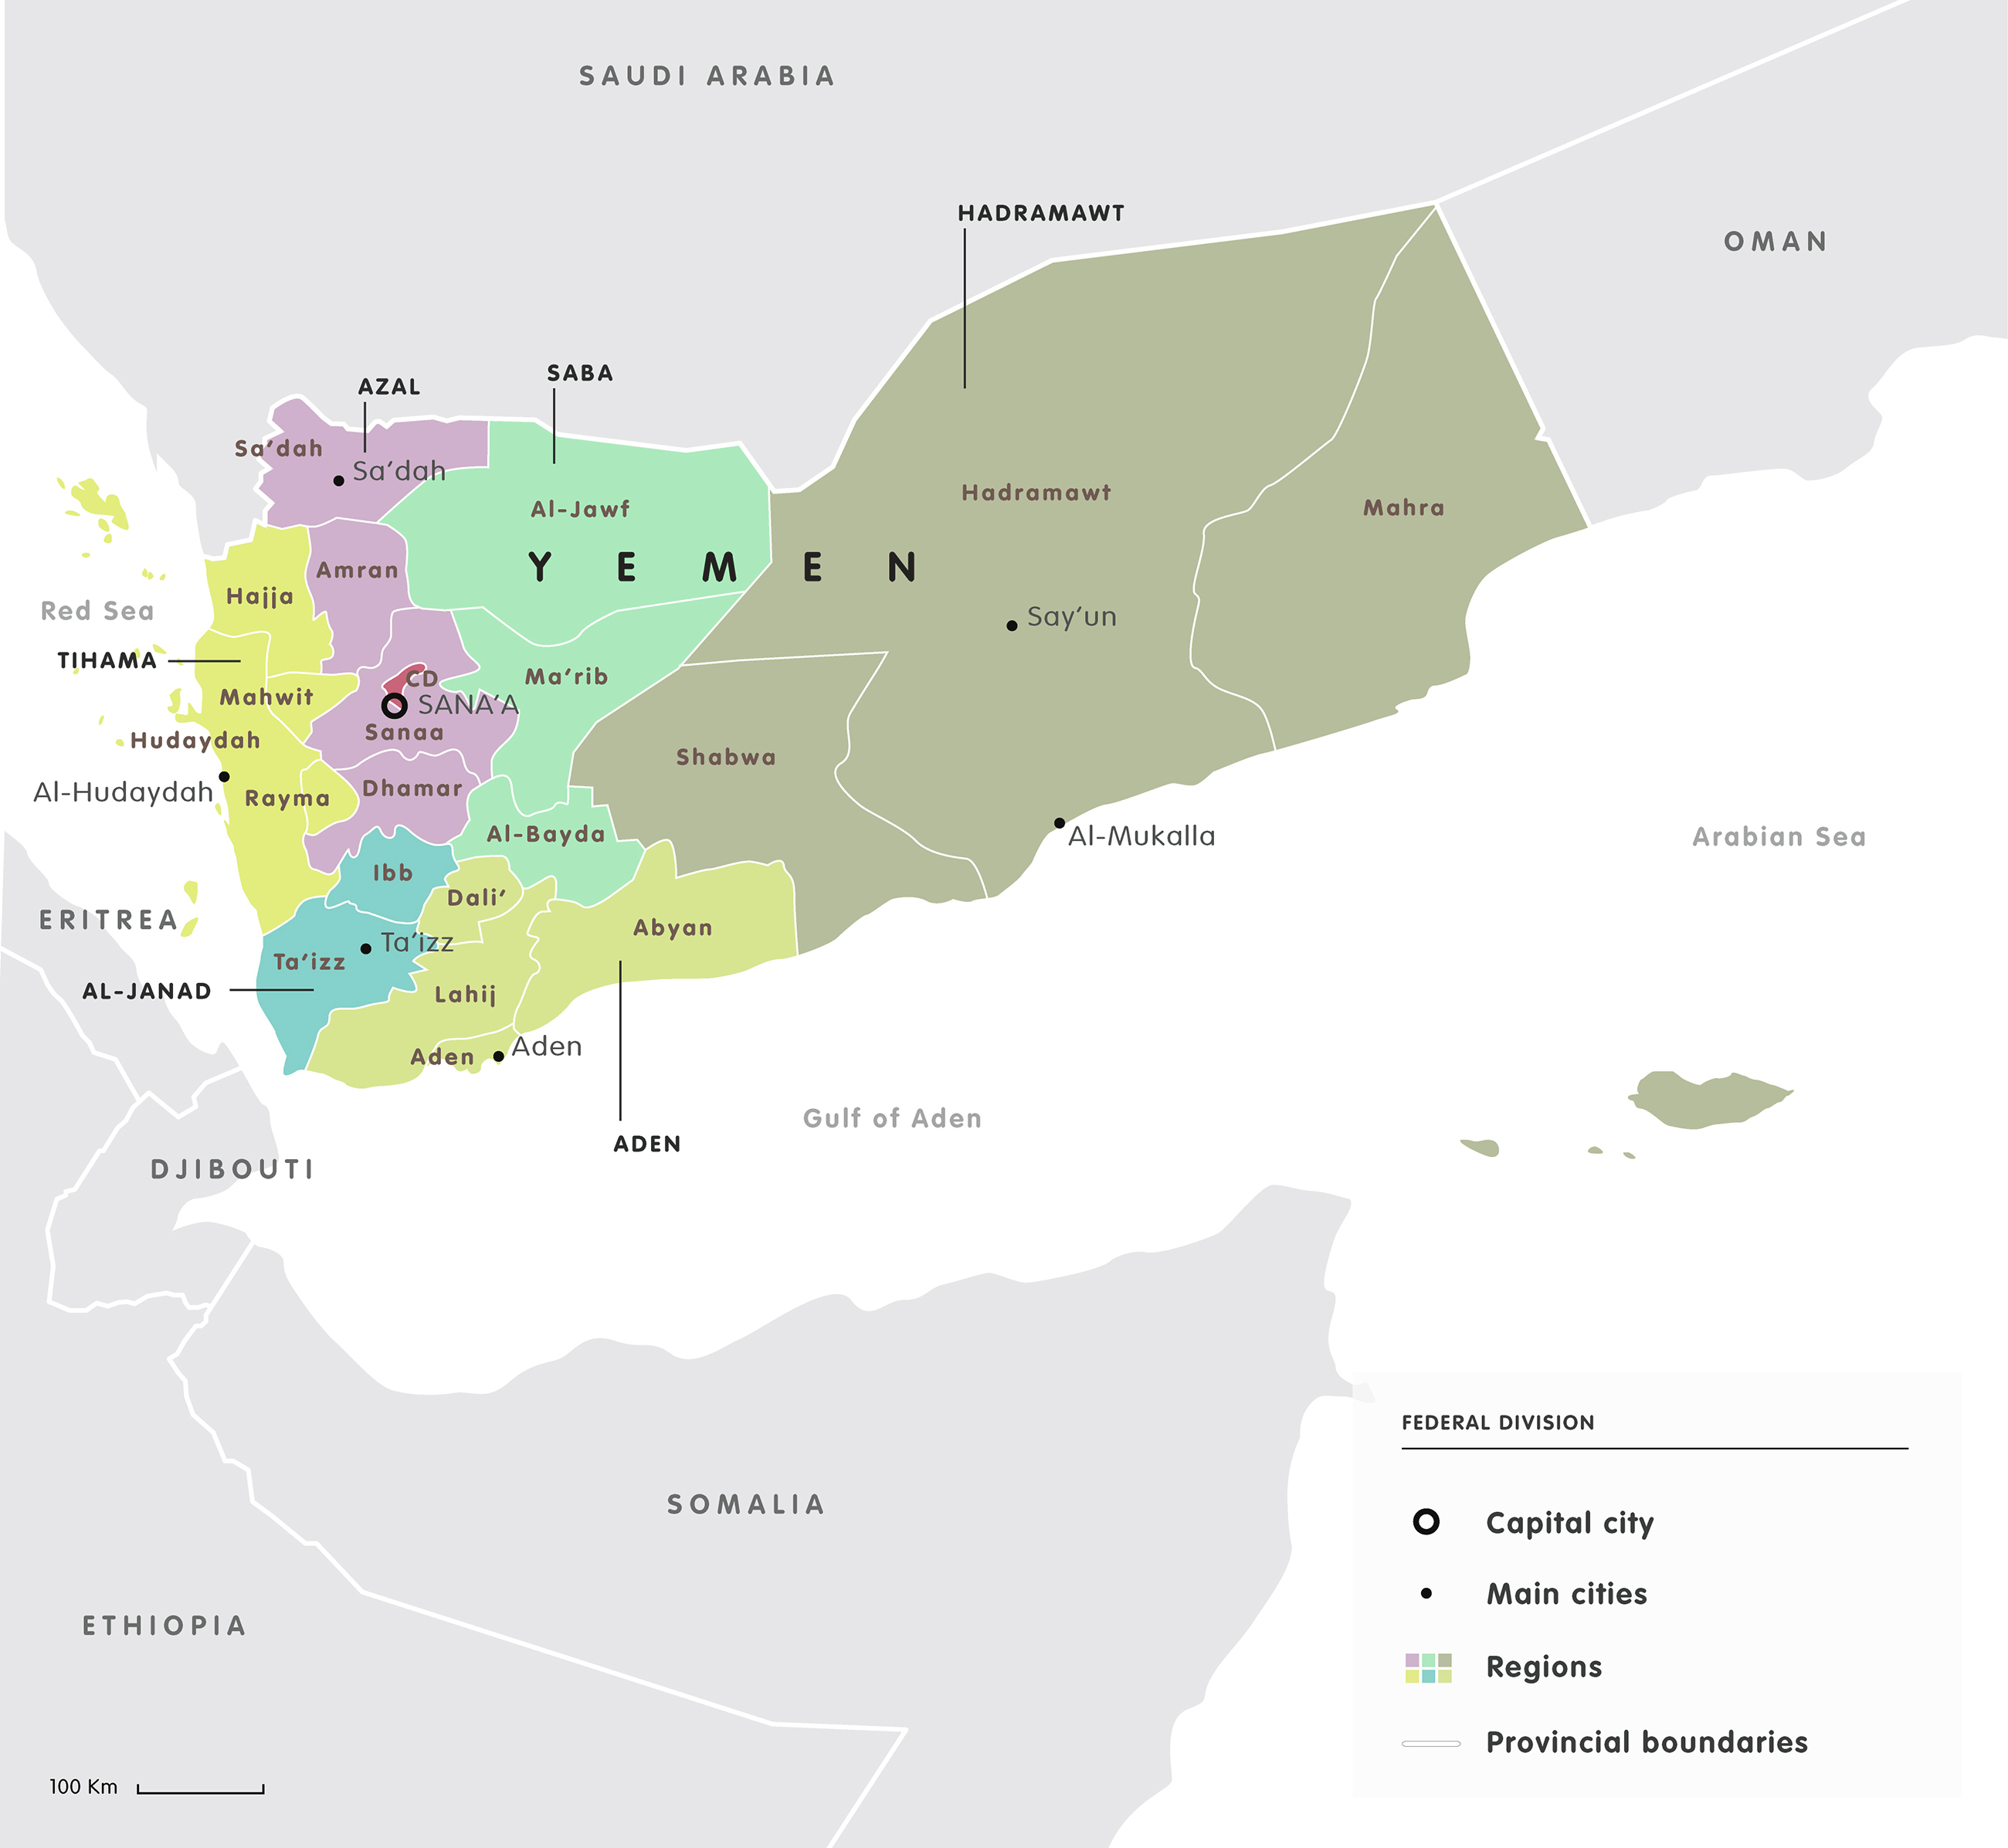 Maps Yemen LibGuides At University Of Illinois At UrbanaChampaign - Map of illinois with capital